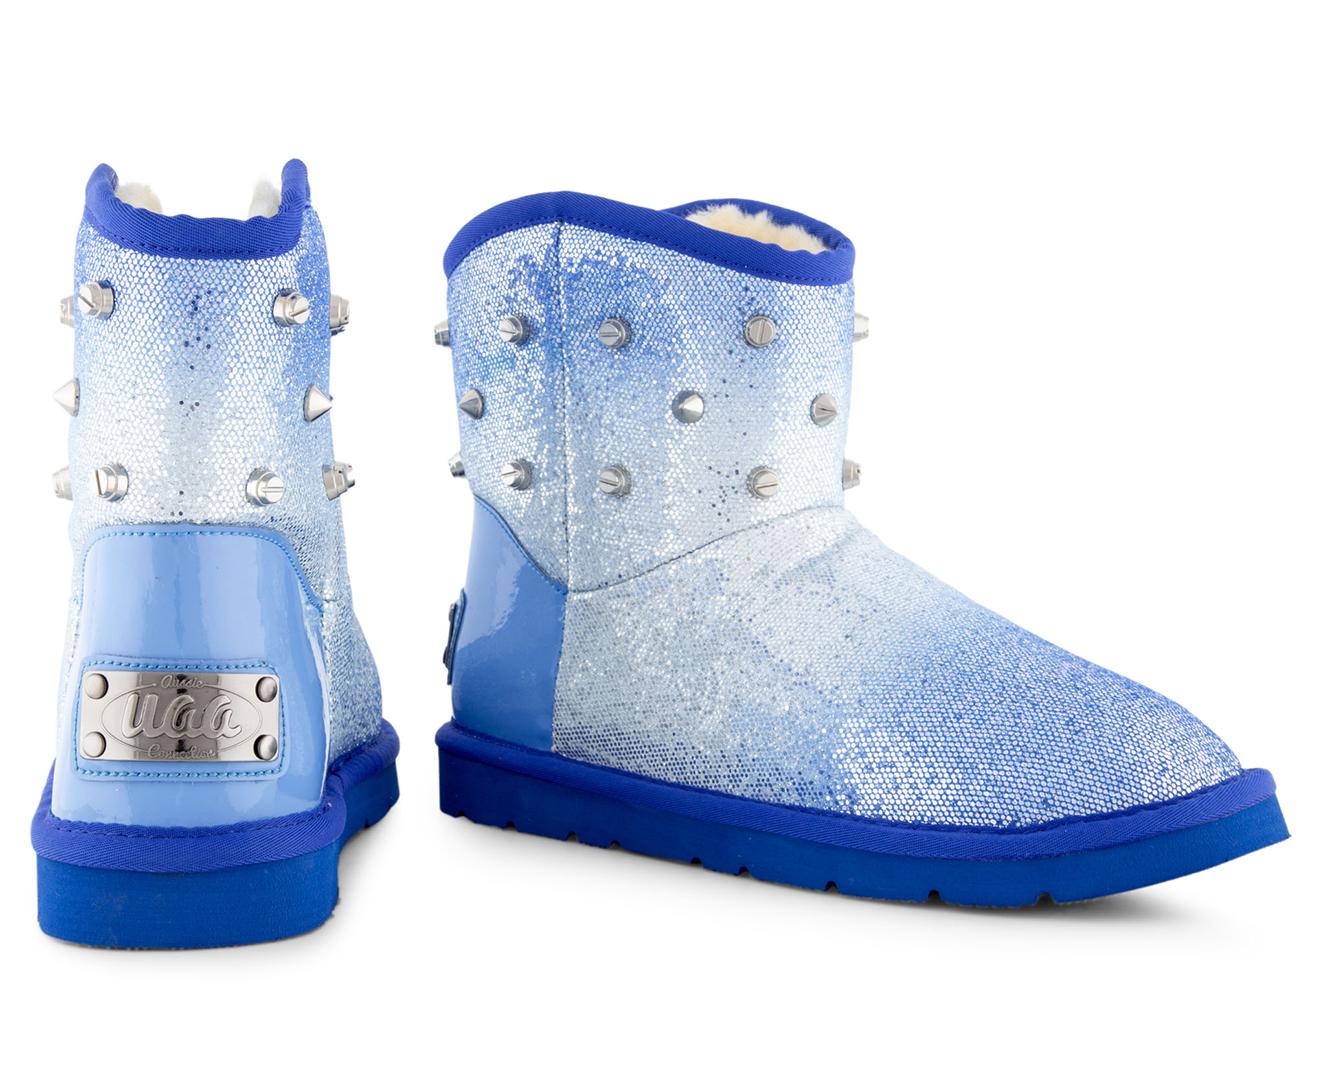 f96afdbd251 Bluestar Women's Premium Australian Sheepskin Studs Ugg Boot - Silver/Blue